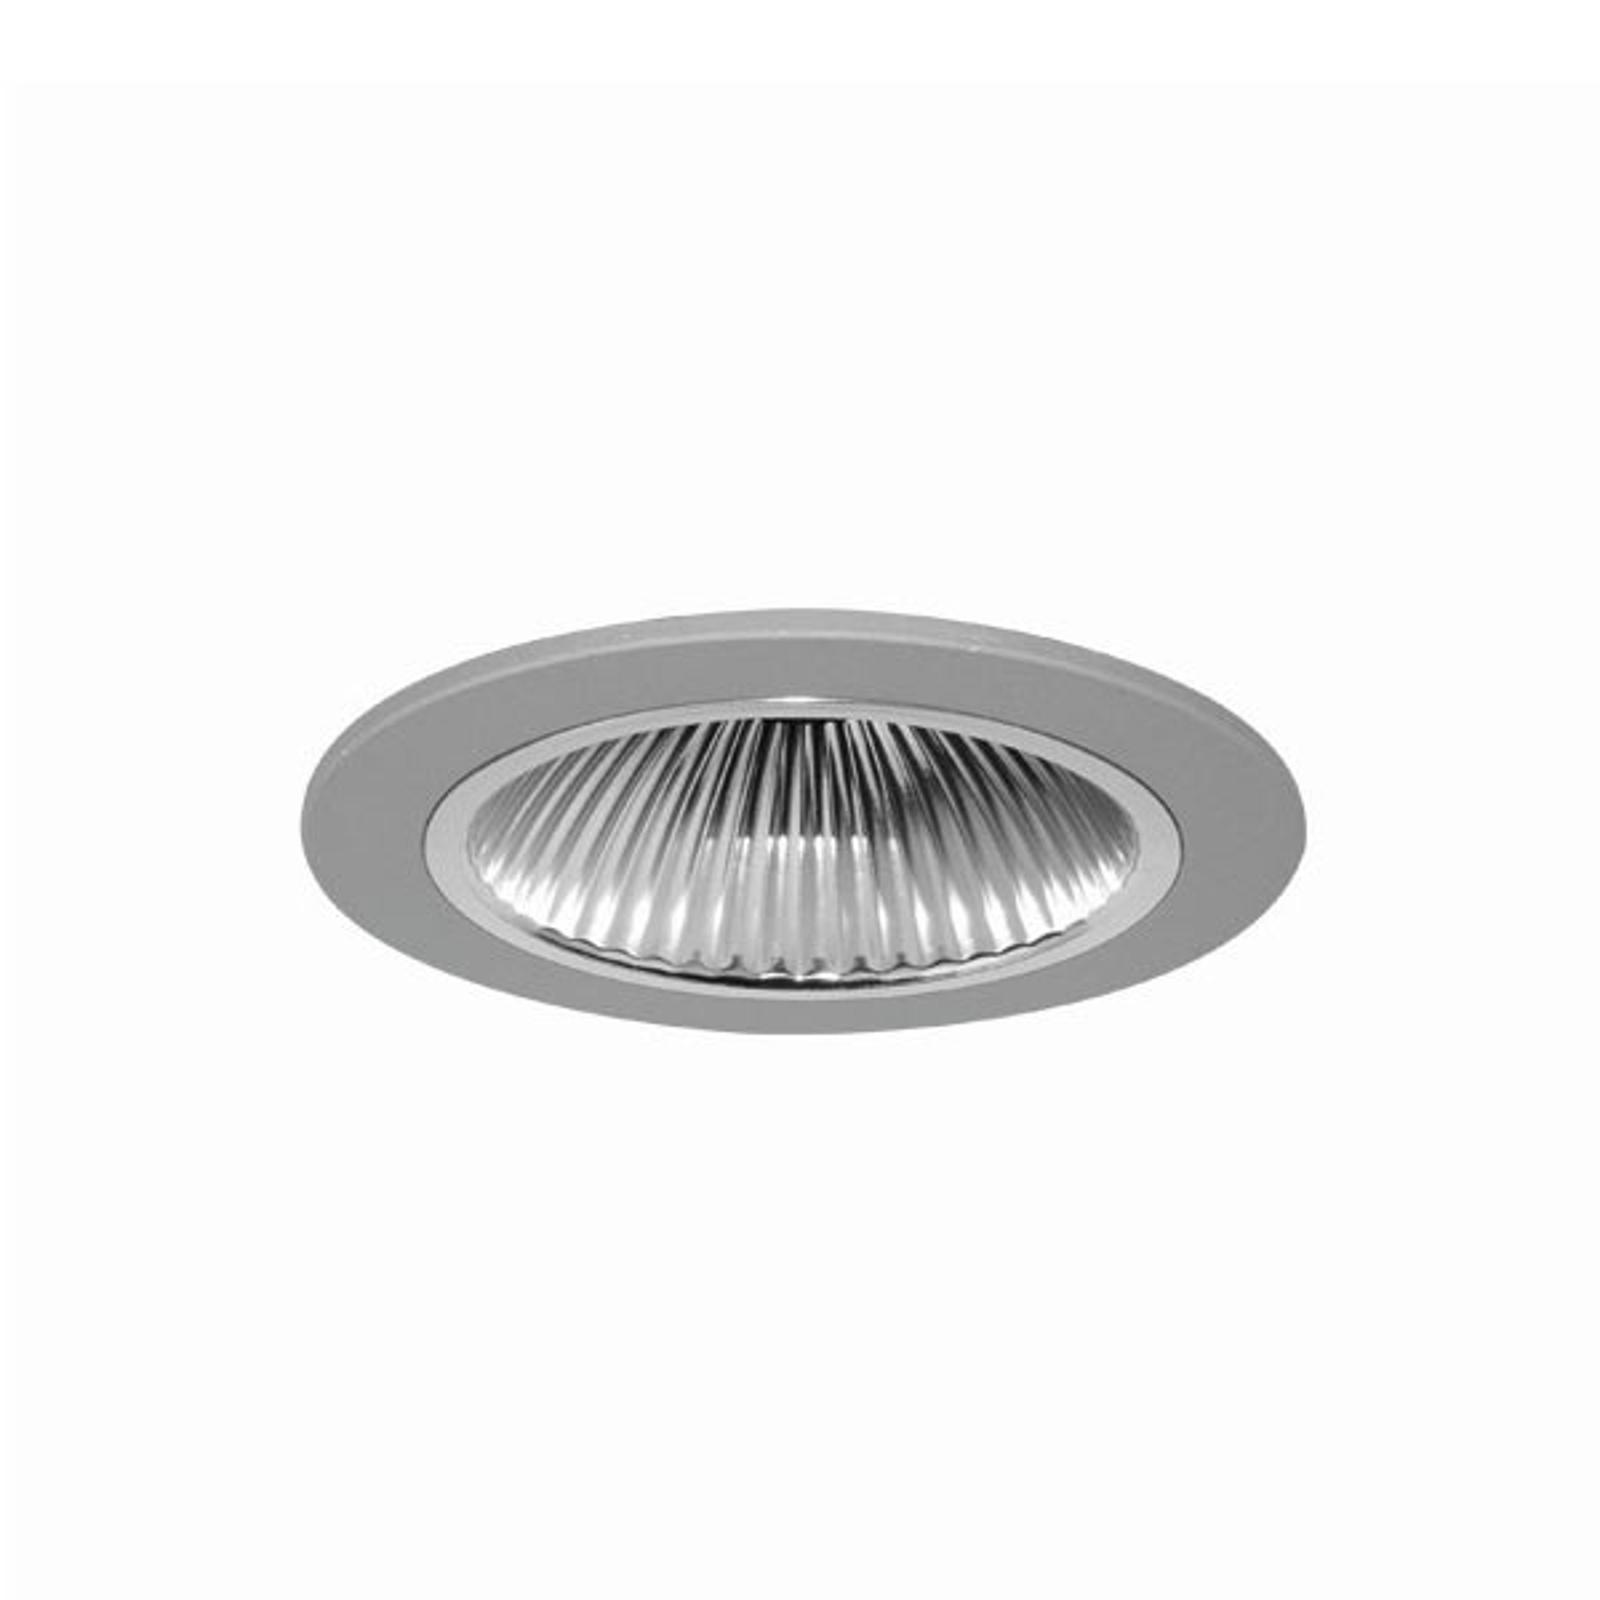 LED-Einbaustrahler CSA 40 Flat, 35°, 14 W, 1410 lm